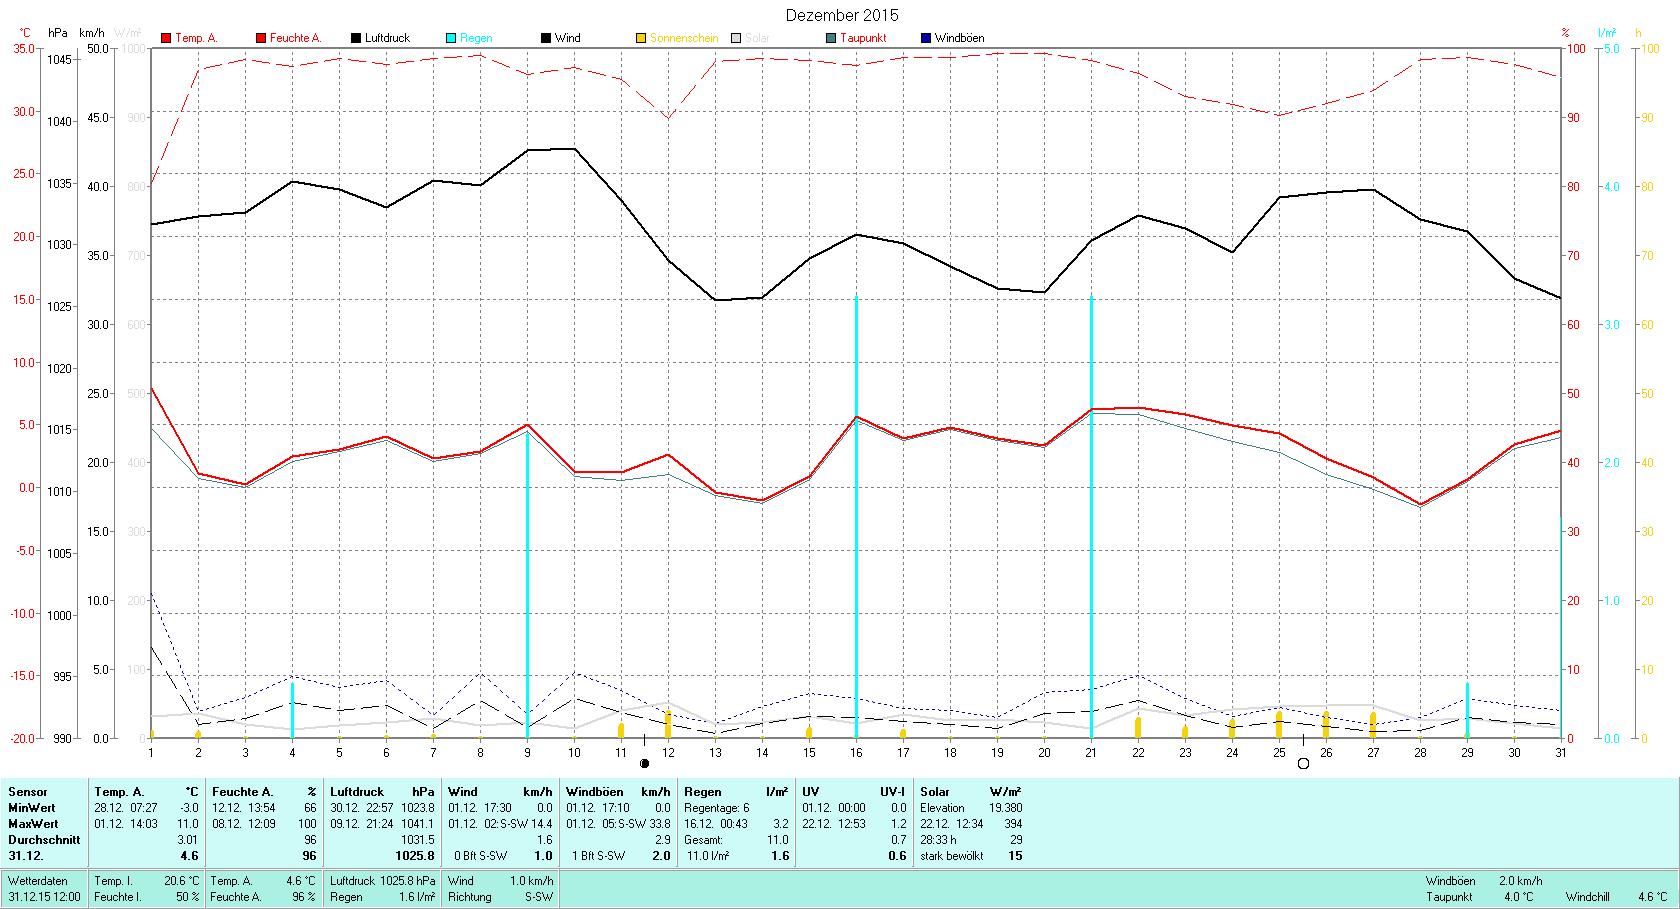 Dezember 2015 Tmin -3.0°C, Tmax 11.0°C, Sonne 28:33h, Niederschlag 11.0mm/2